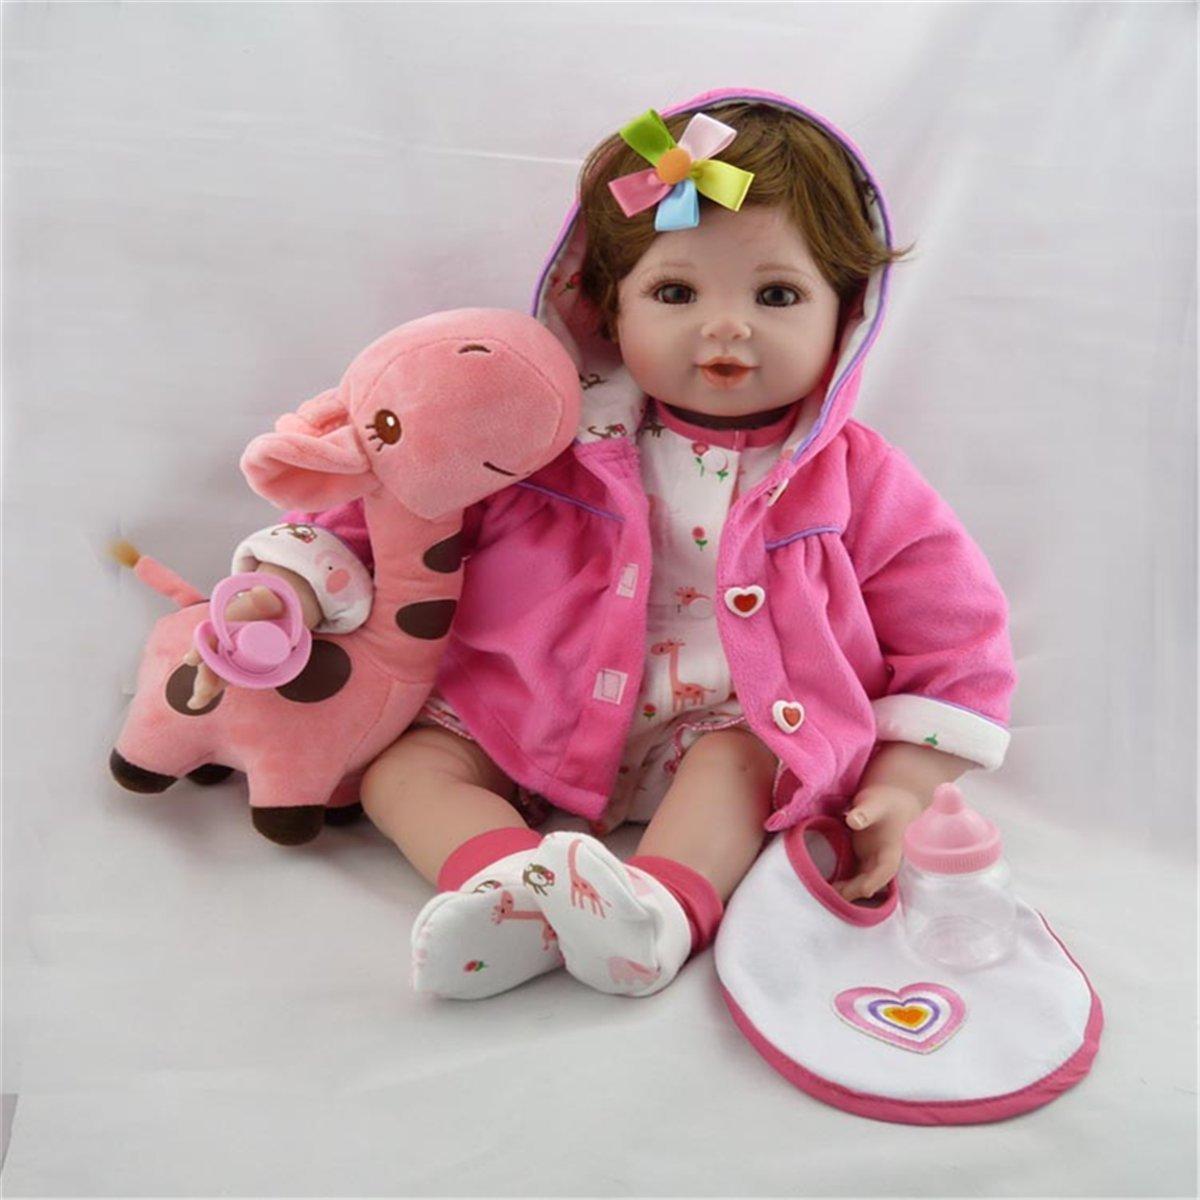 0bc99a36f ... Bebe Reborn Manu Detalhes Reais Barata No Elo7 Ateliê Ana D ·  SuuforestNET 11inch African Reborn Baby Doll ...